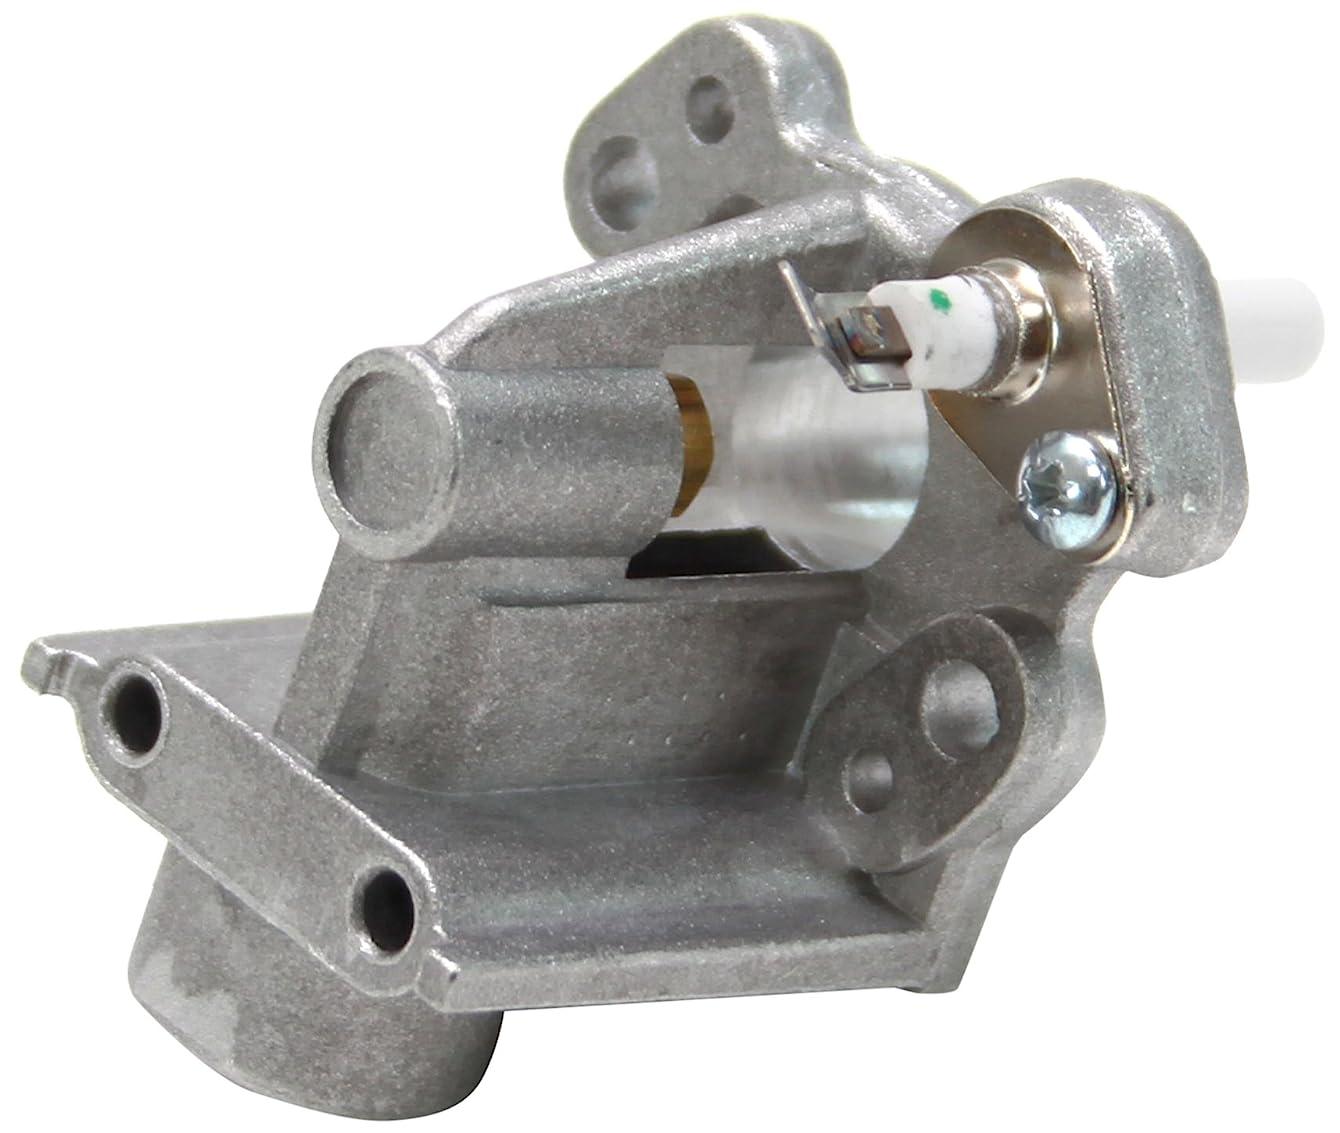 Maytag WP7527P023-60 Cooktop Parts Use Wpl 74007816